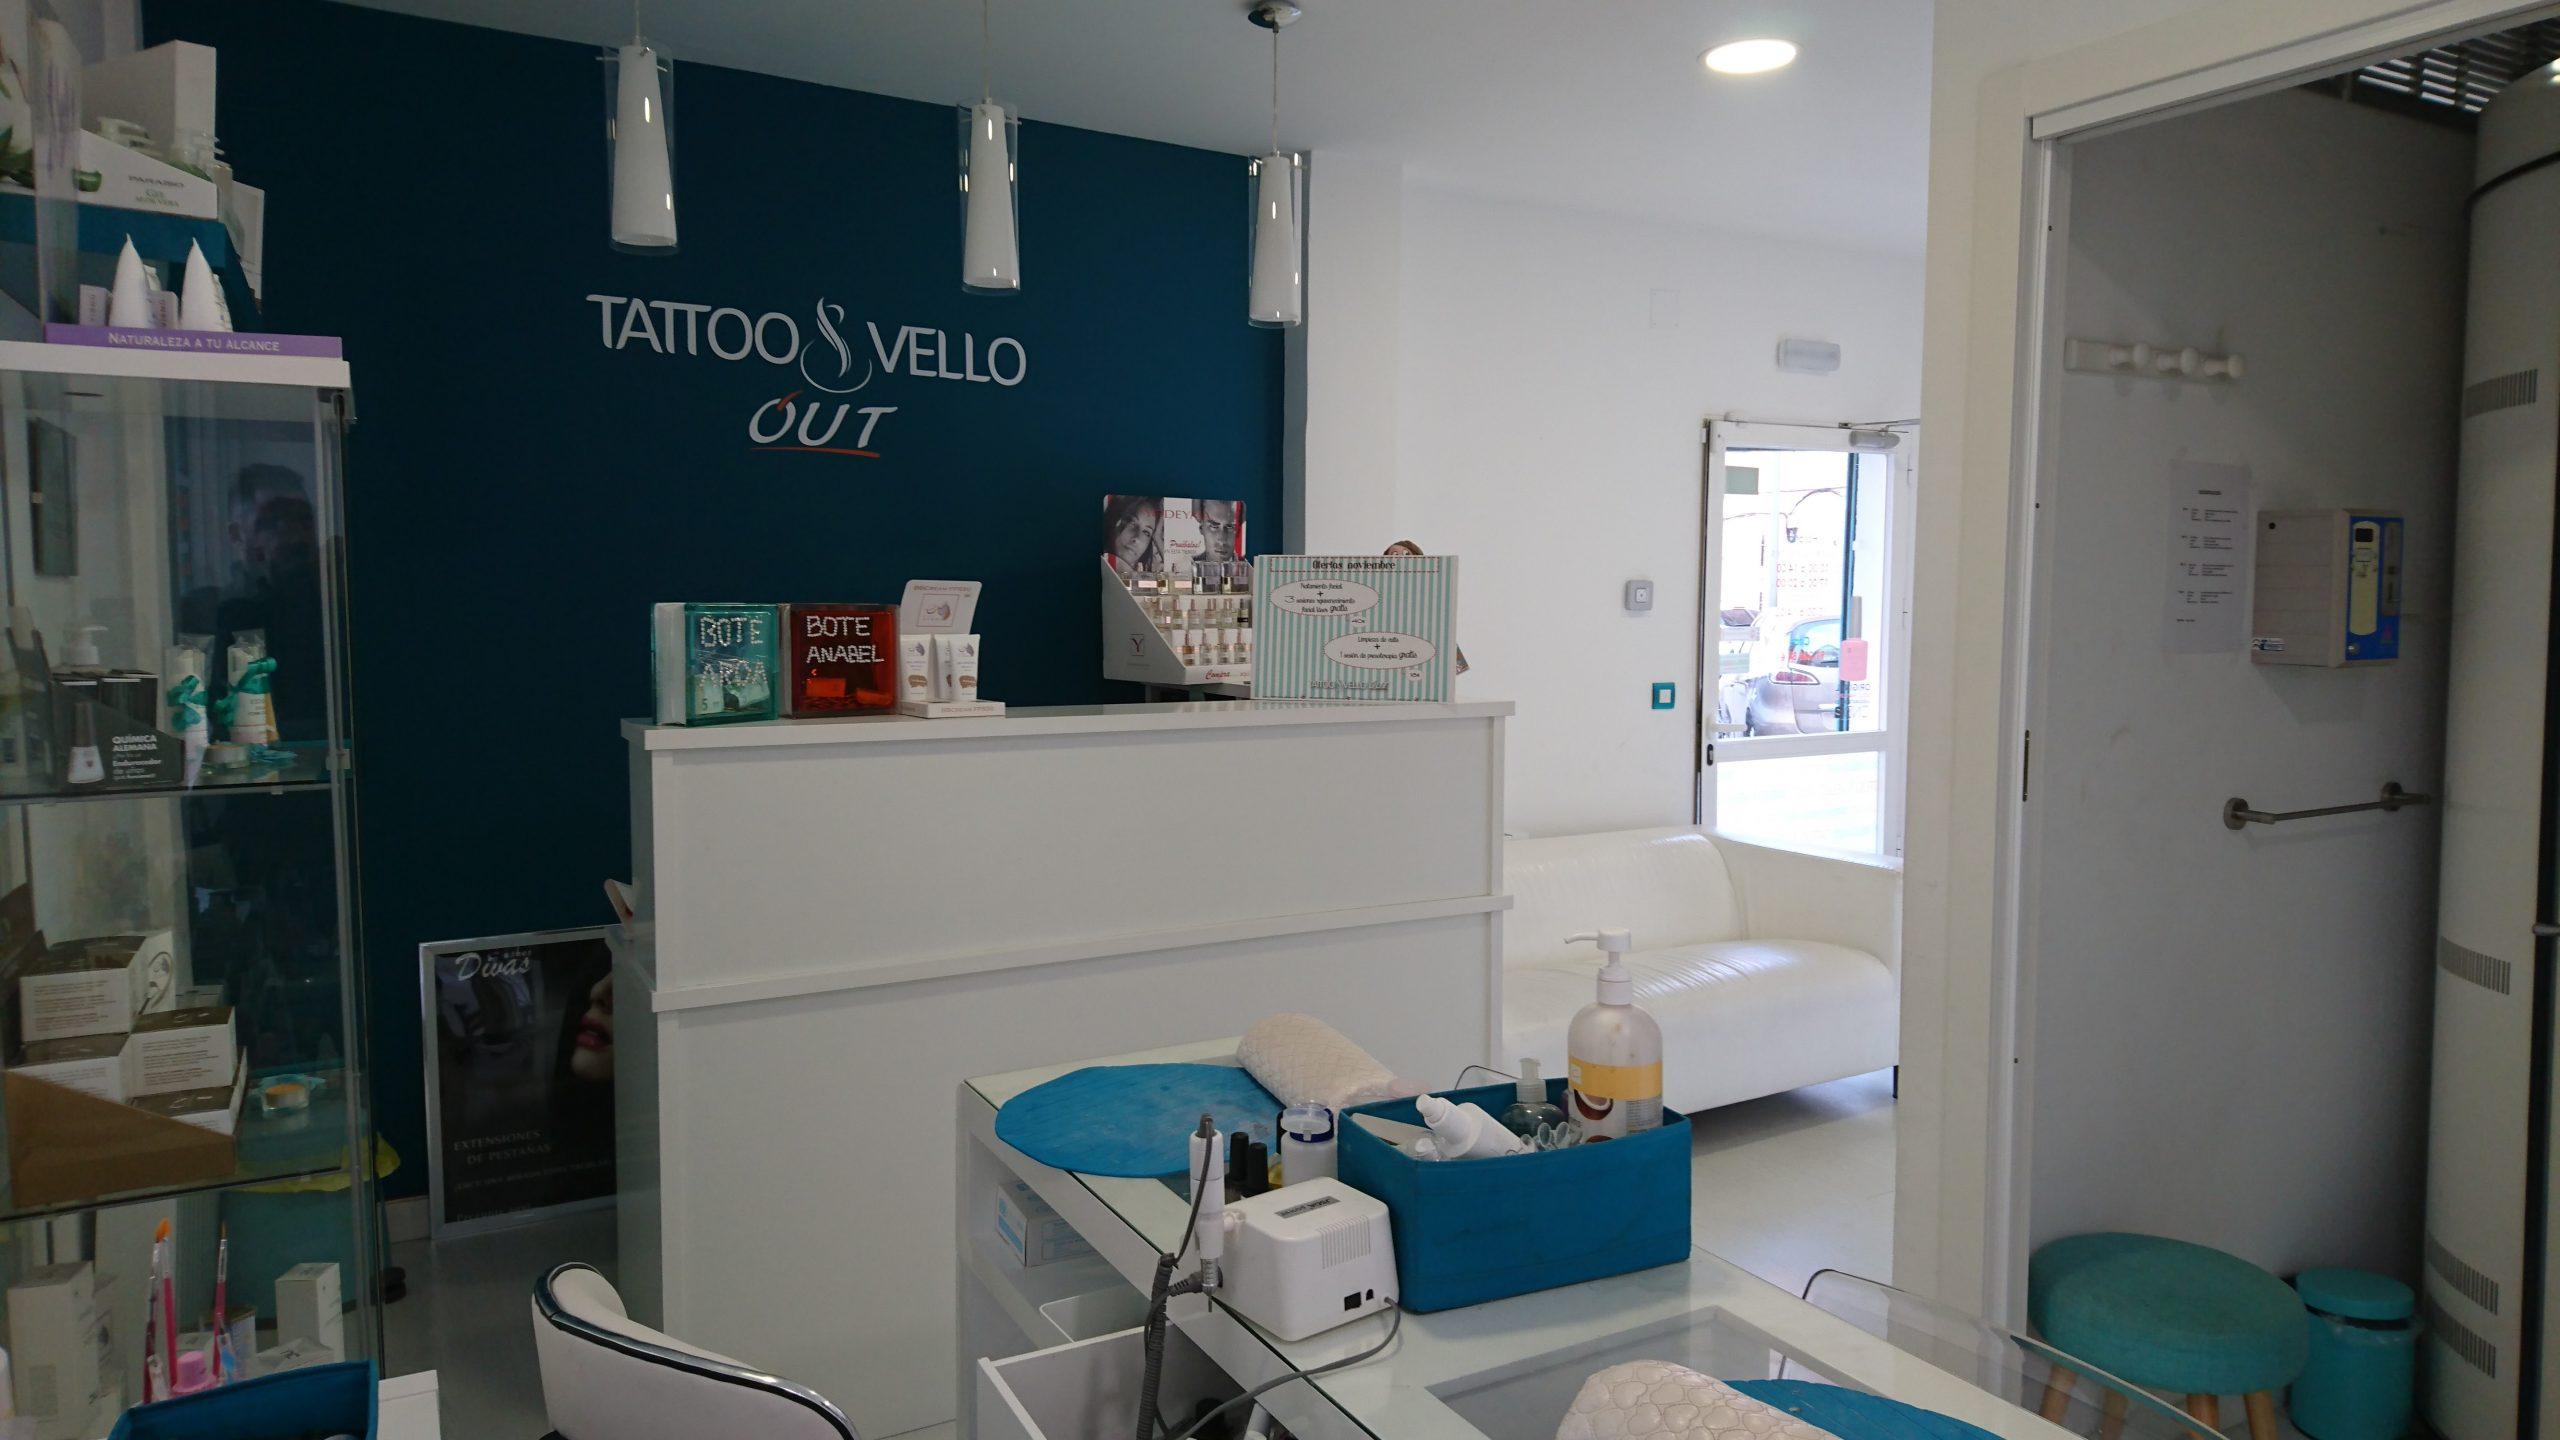 Entrevista y reportaje a Tattoo & vello out, tu centro estetico imprescindible en móstoles